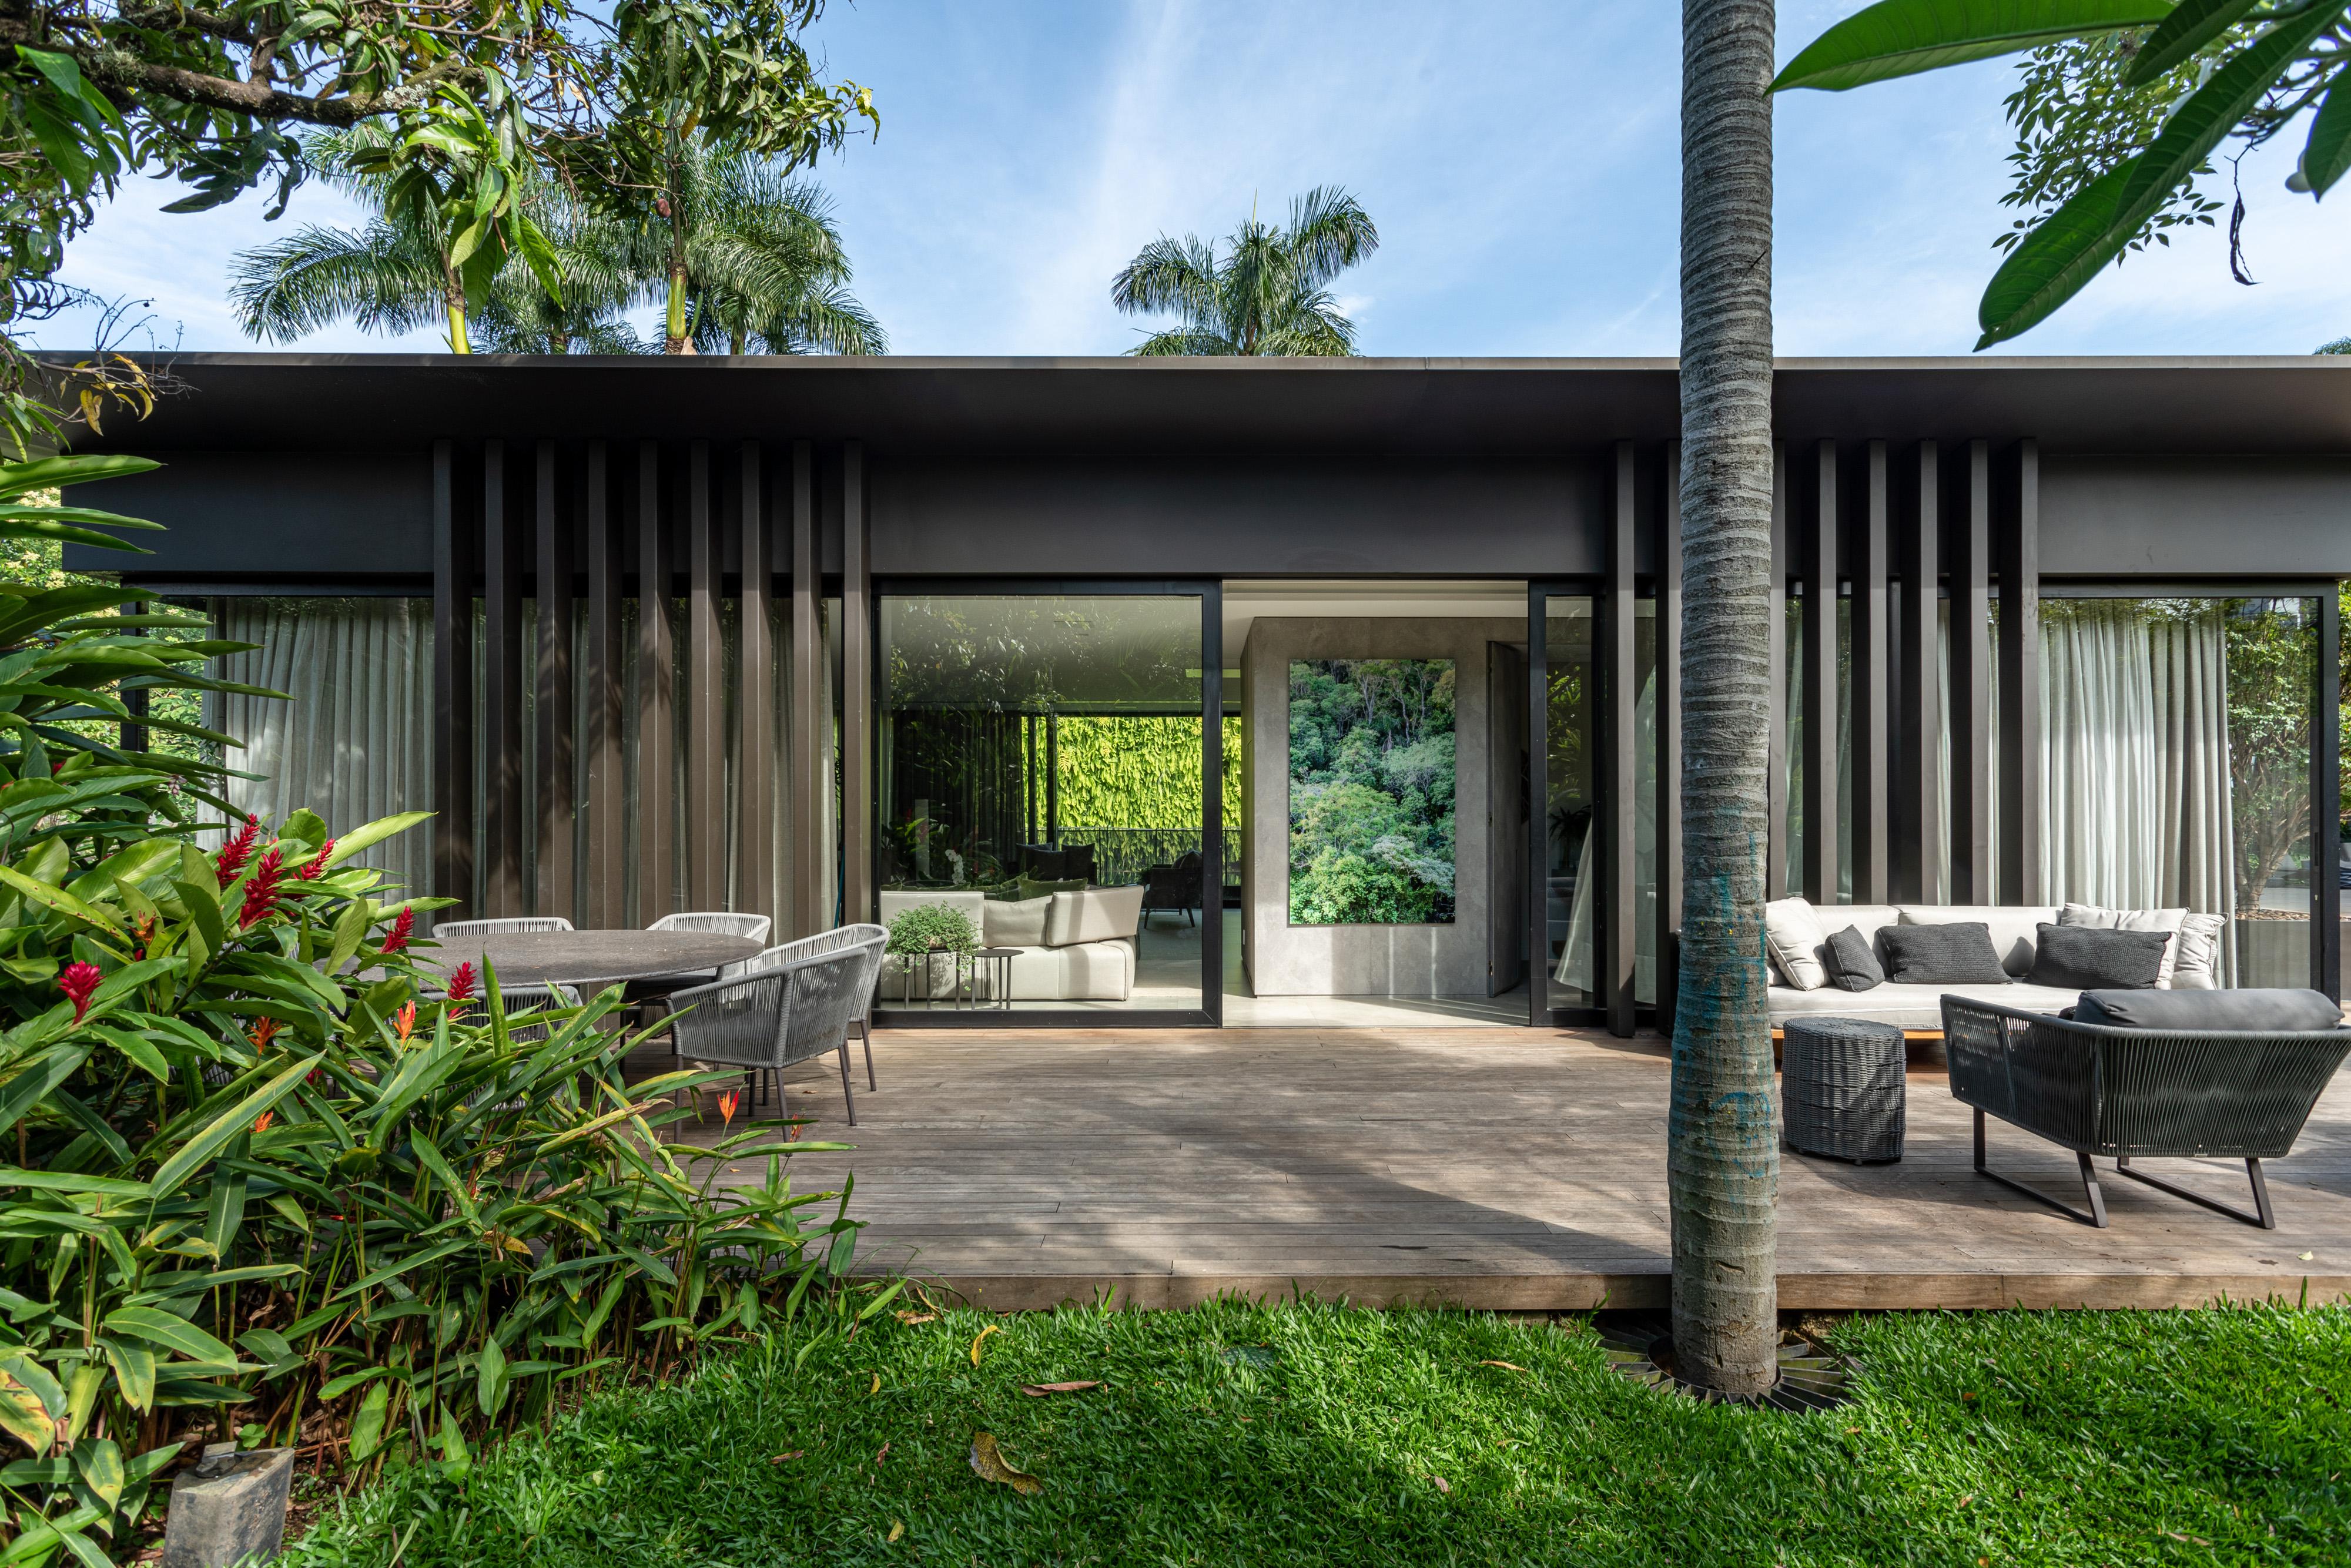 Fachada de casa de estilo contemporâneo